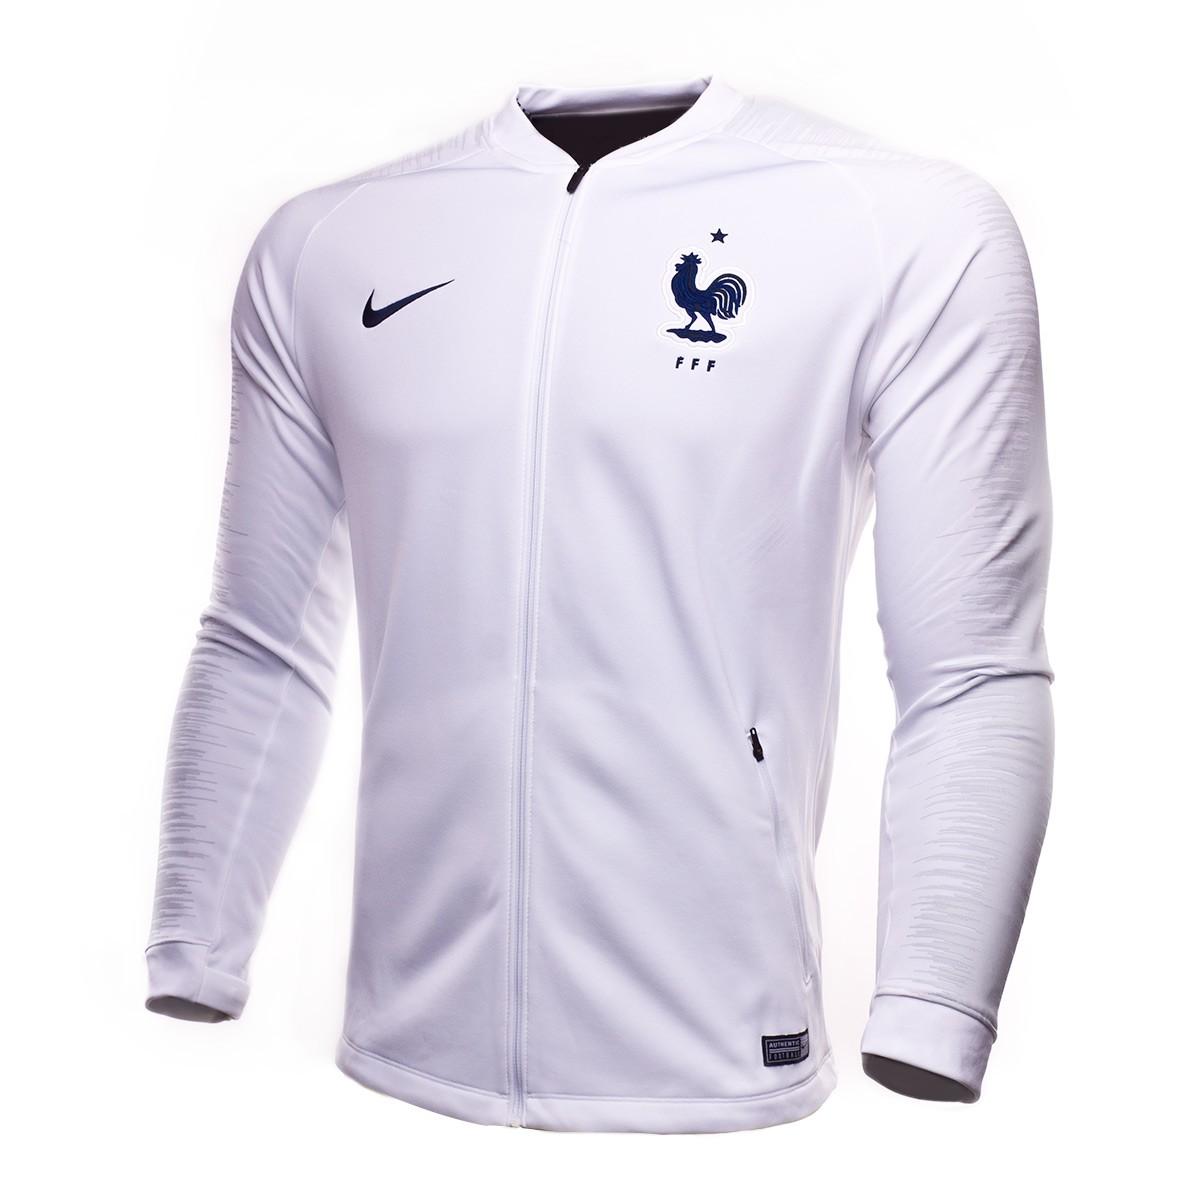 beb4bc5804b9a Chaqueta Nike Francia Pre-Match 2018-2019 White-Pure platinum-Obsidian -  Tienda de fútbol Fútbol Emotion